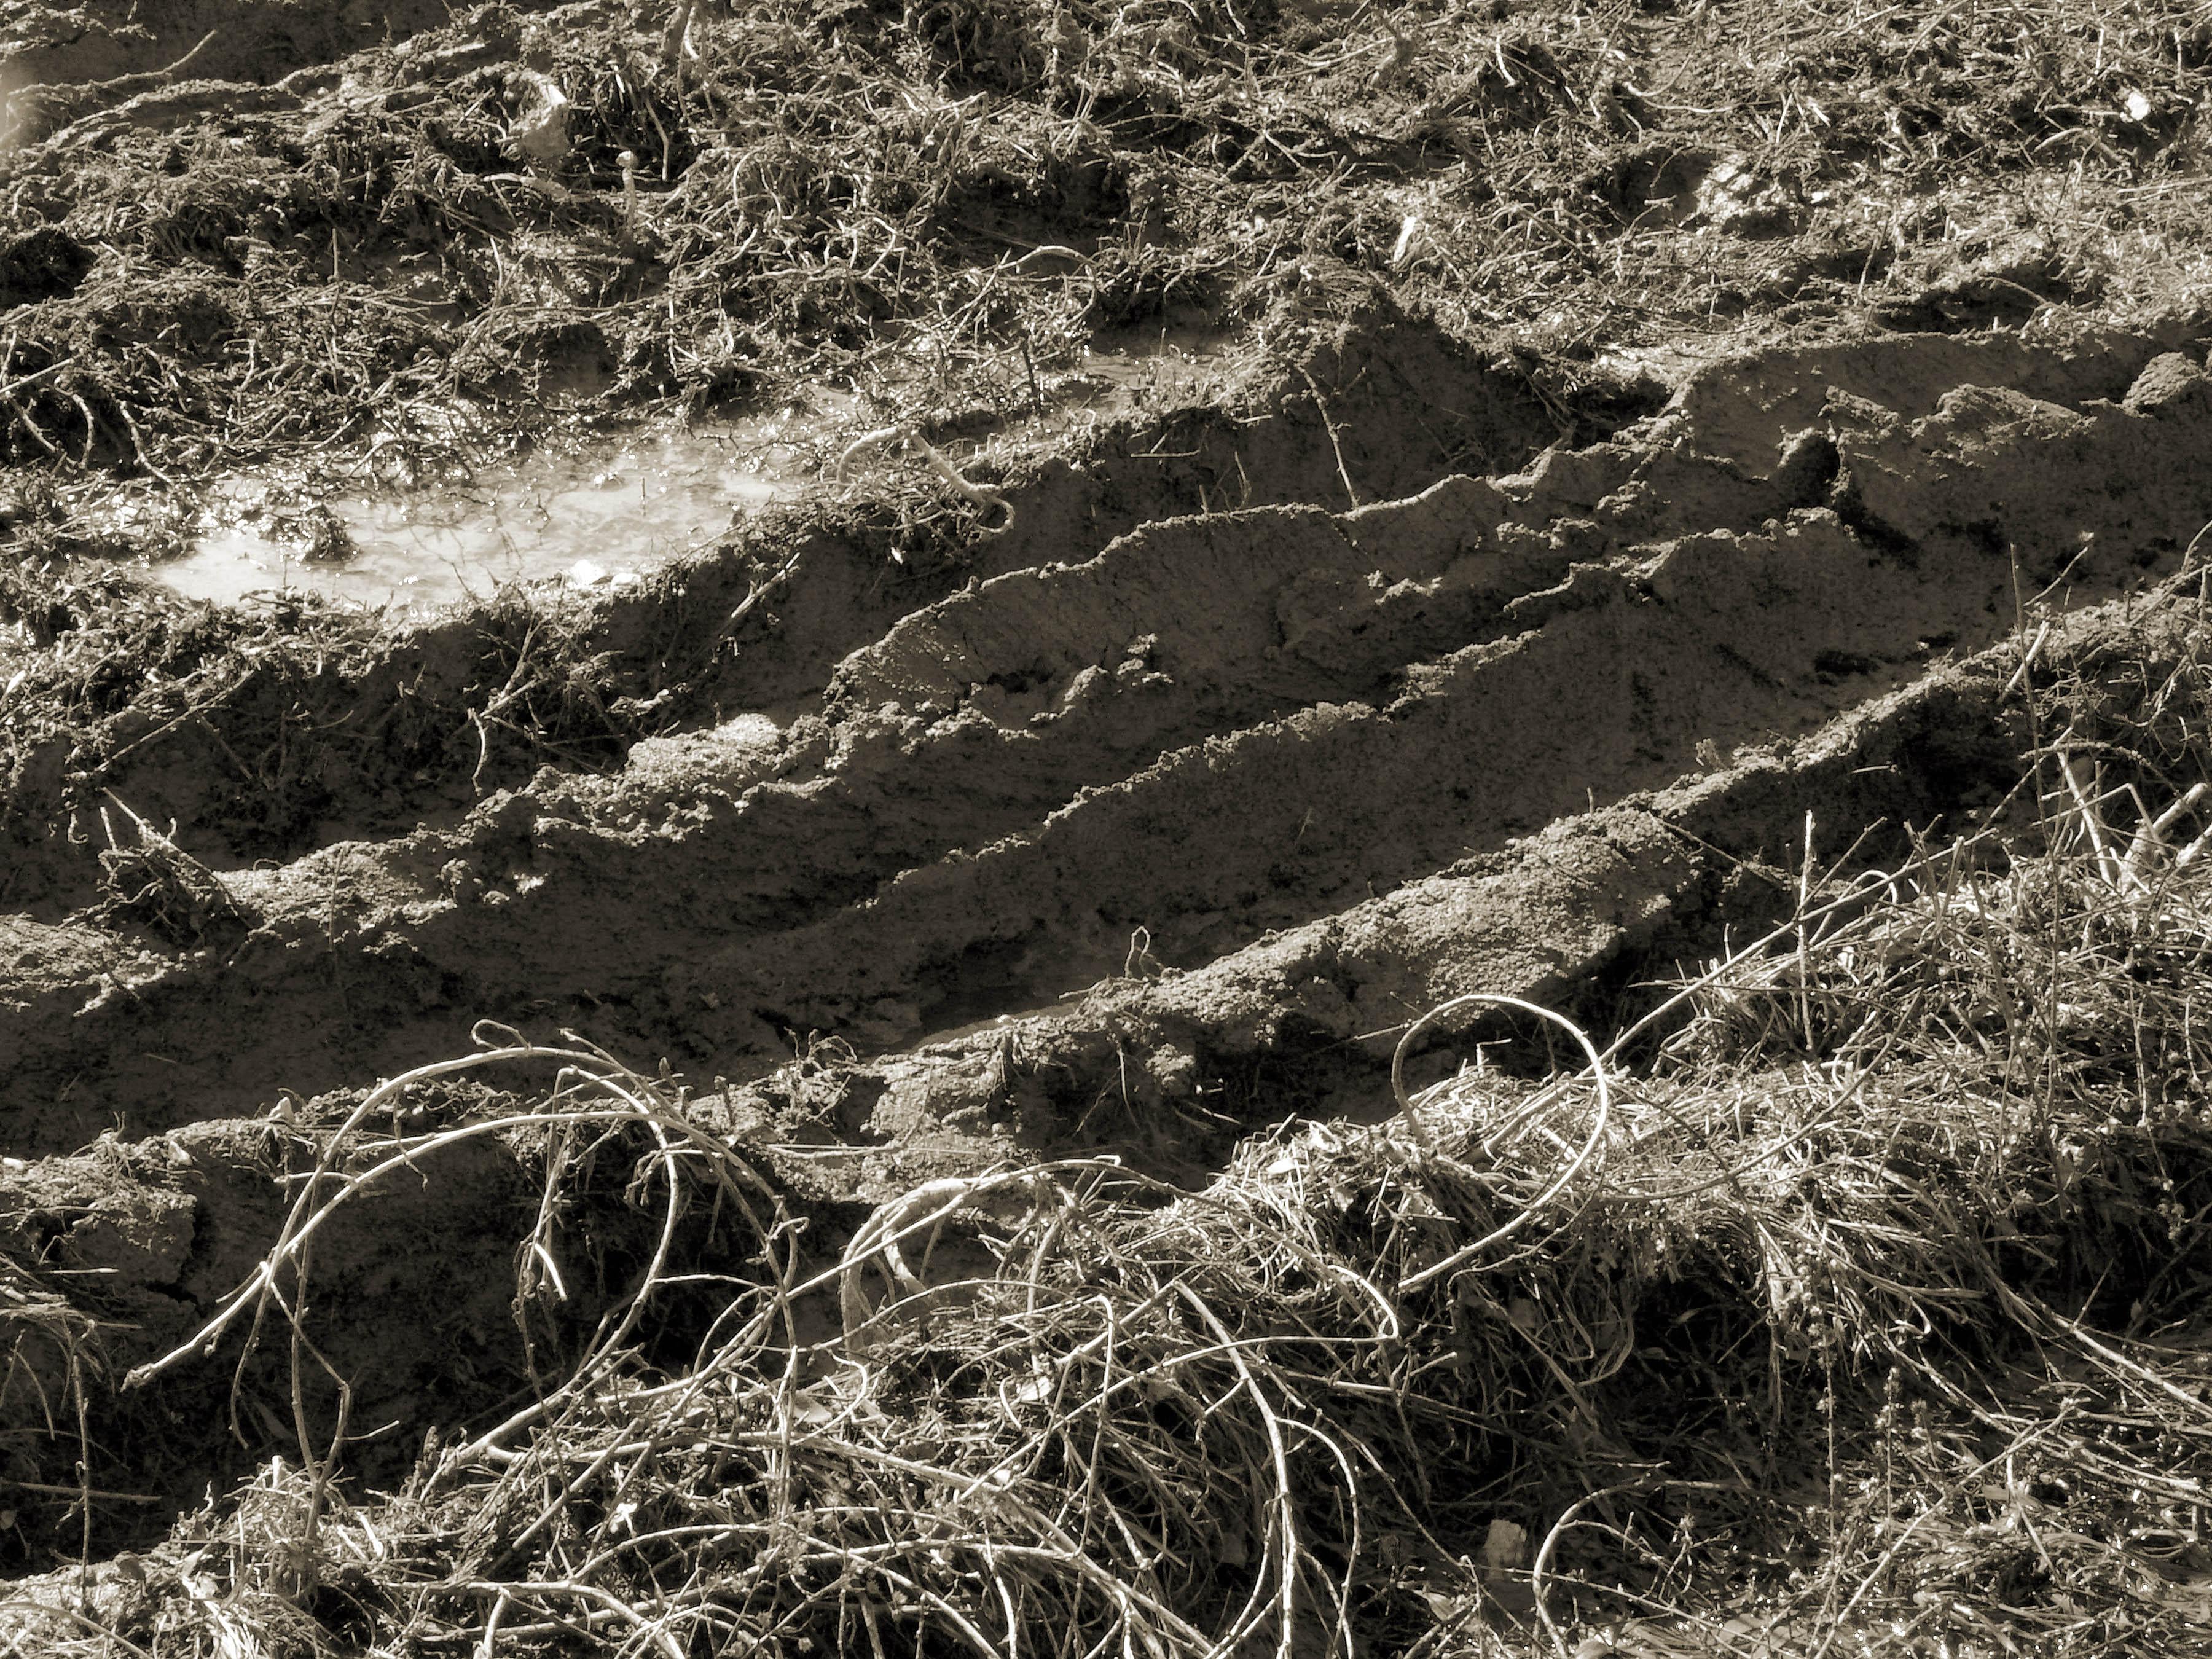 Mud Tracks, photograph